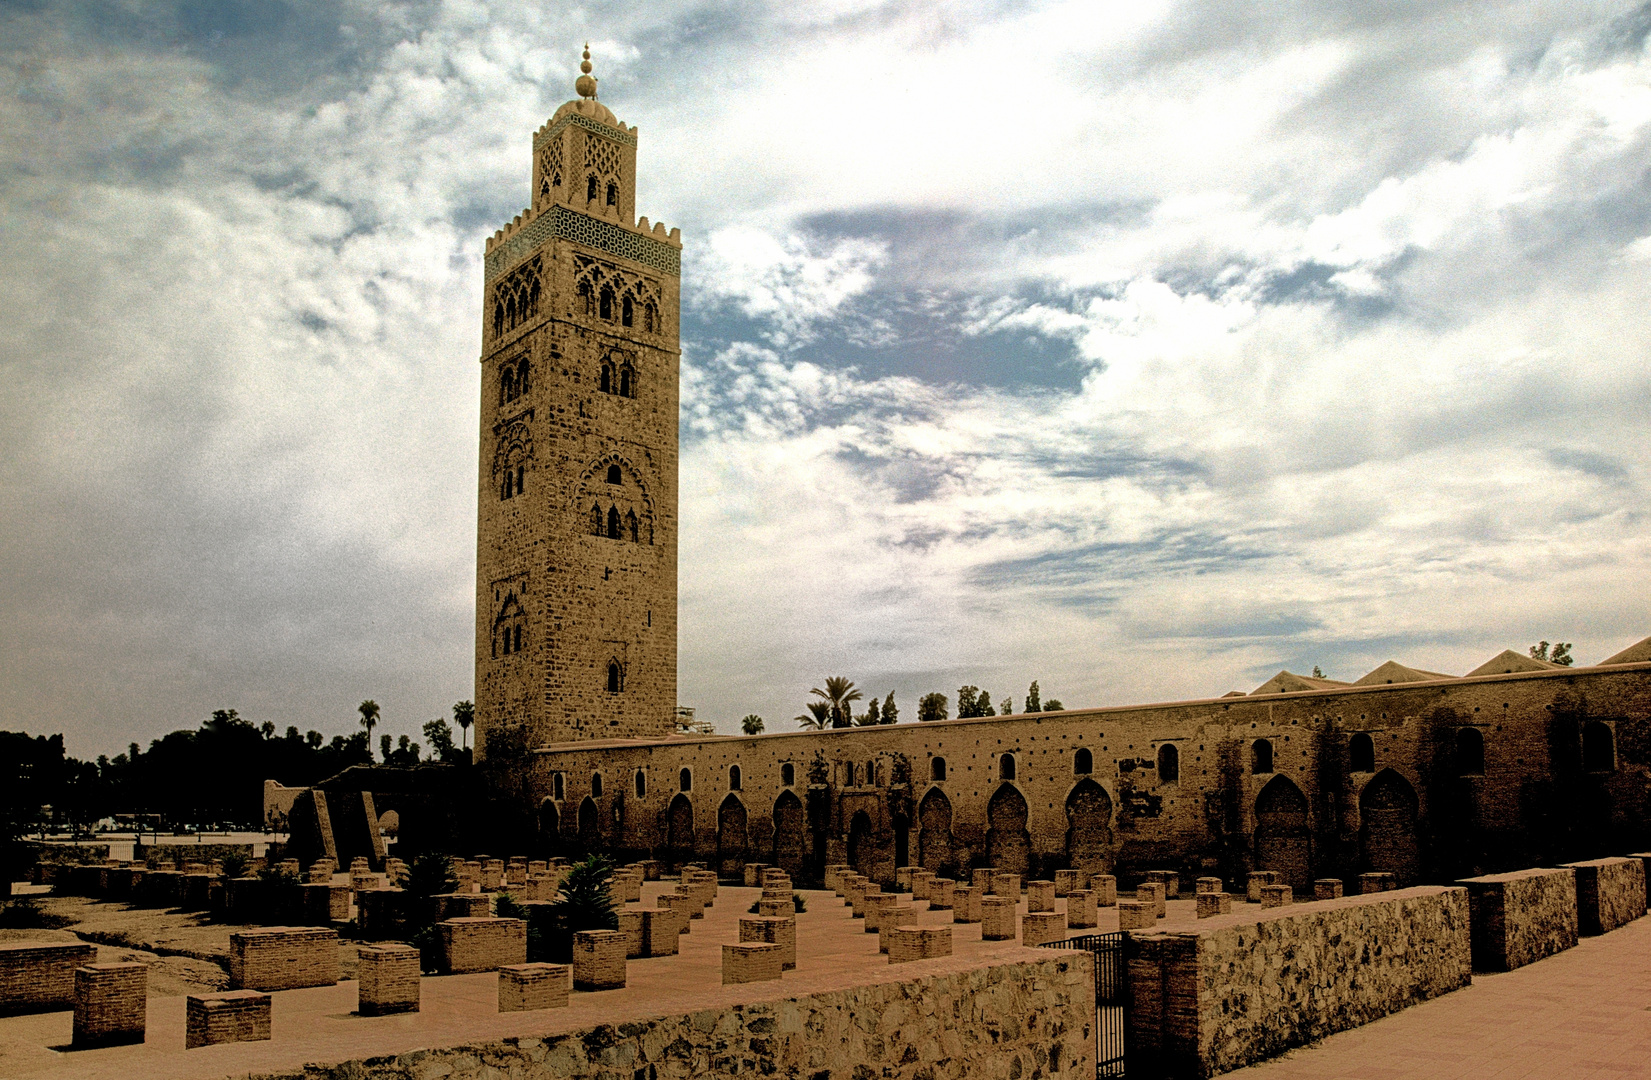 Kutubiya Moschee in Marrakech